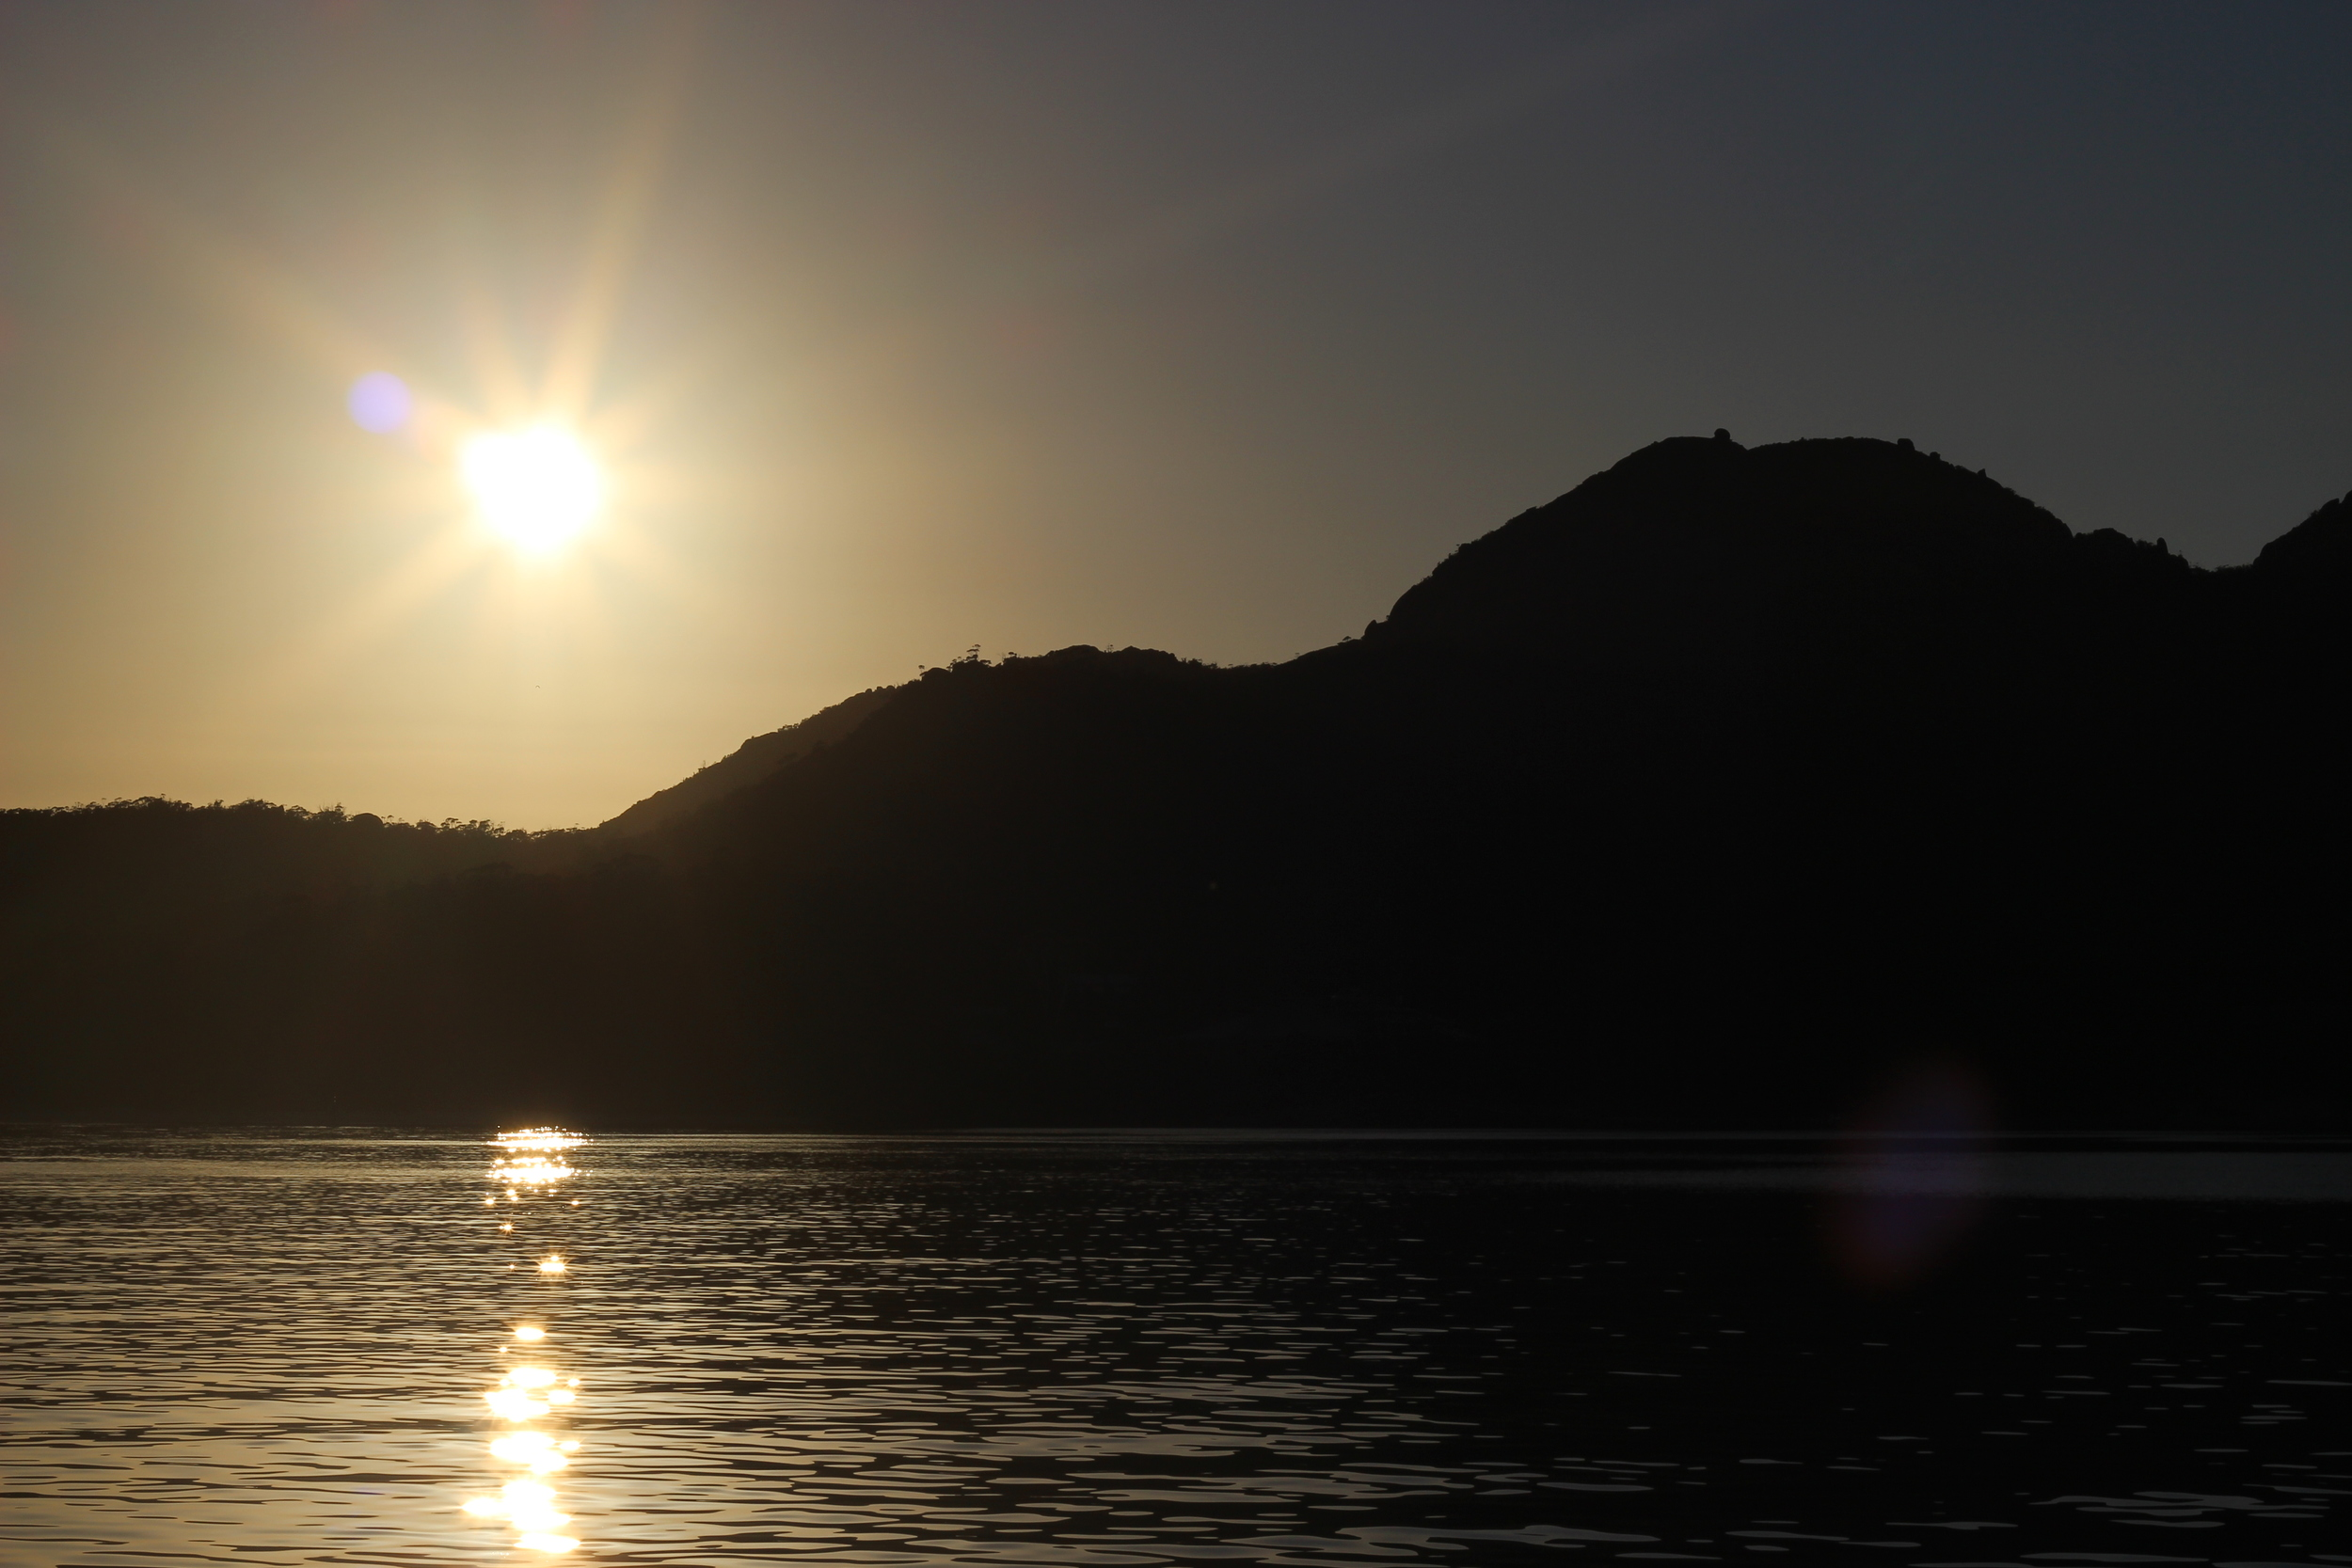 Sunrise over the Hazards